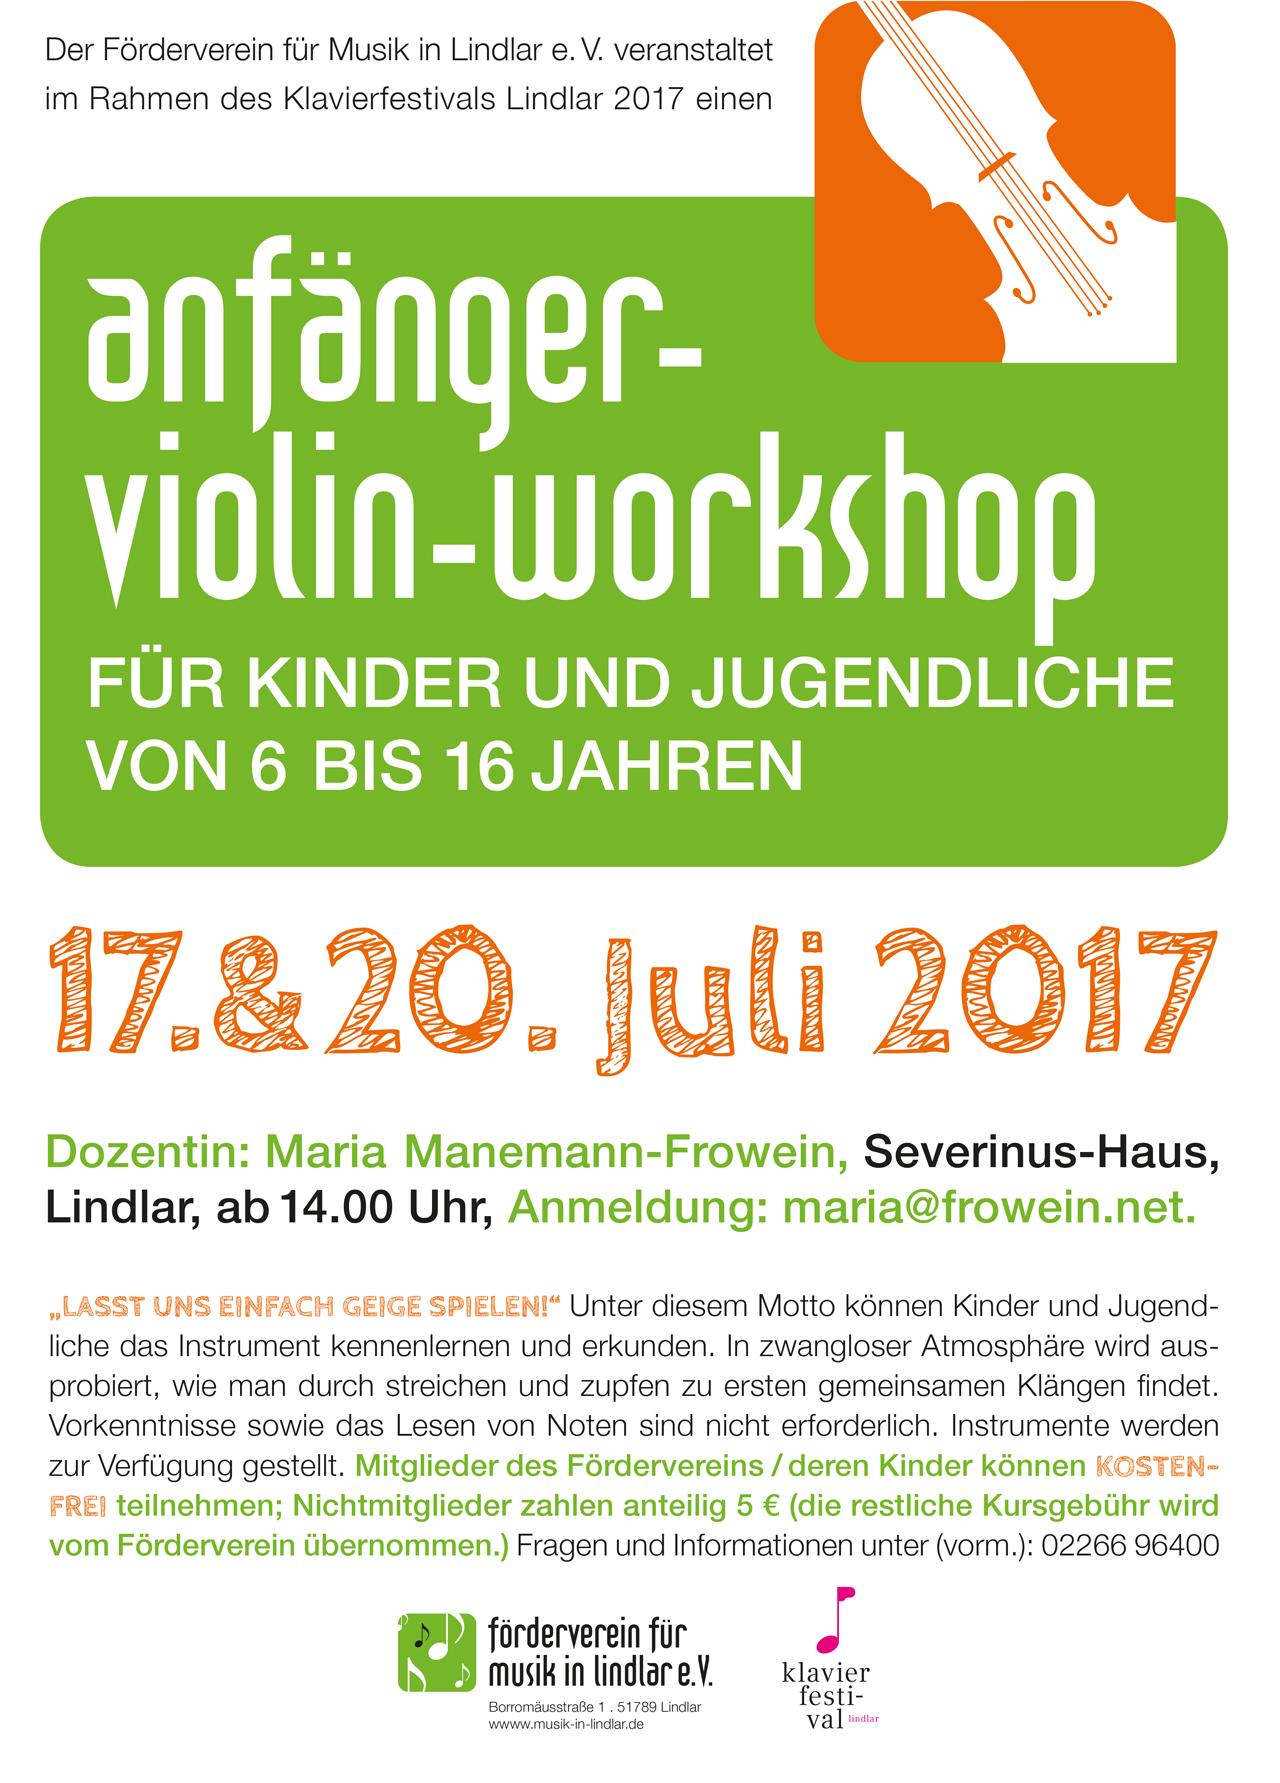 LG_Poster-Violin-1